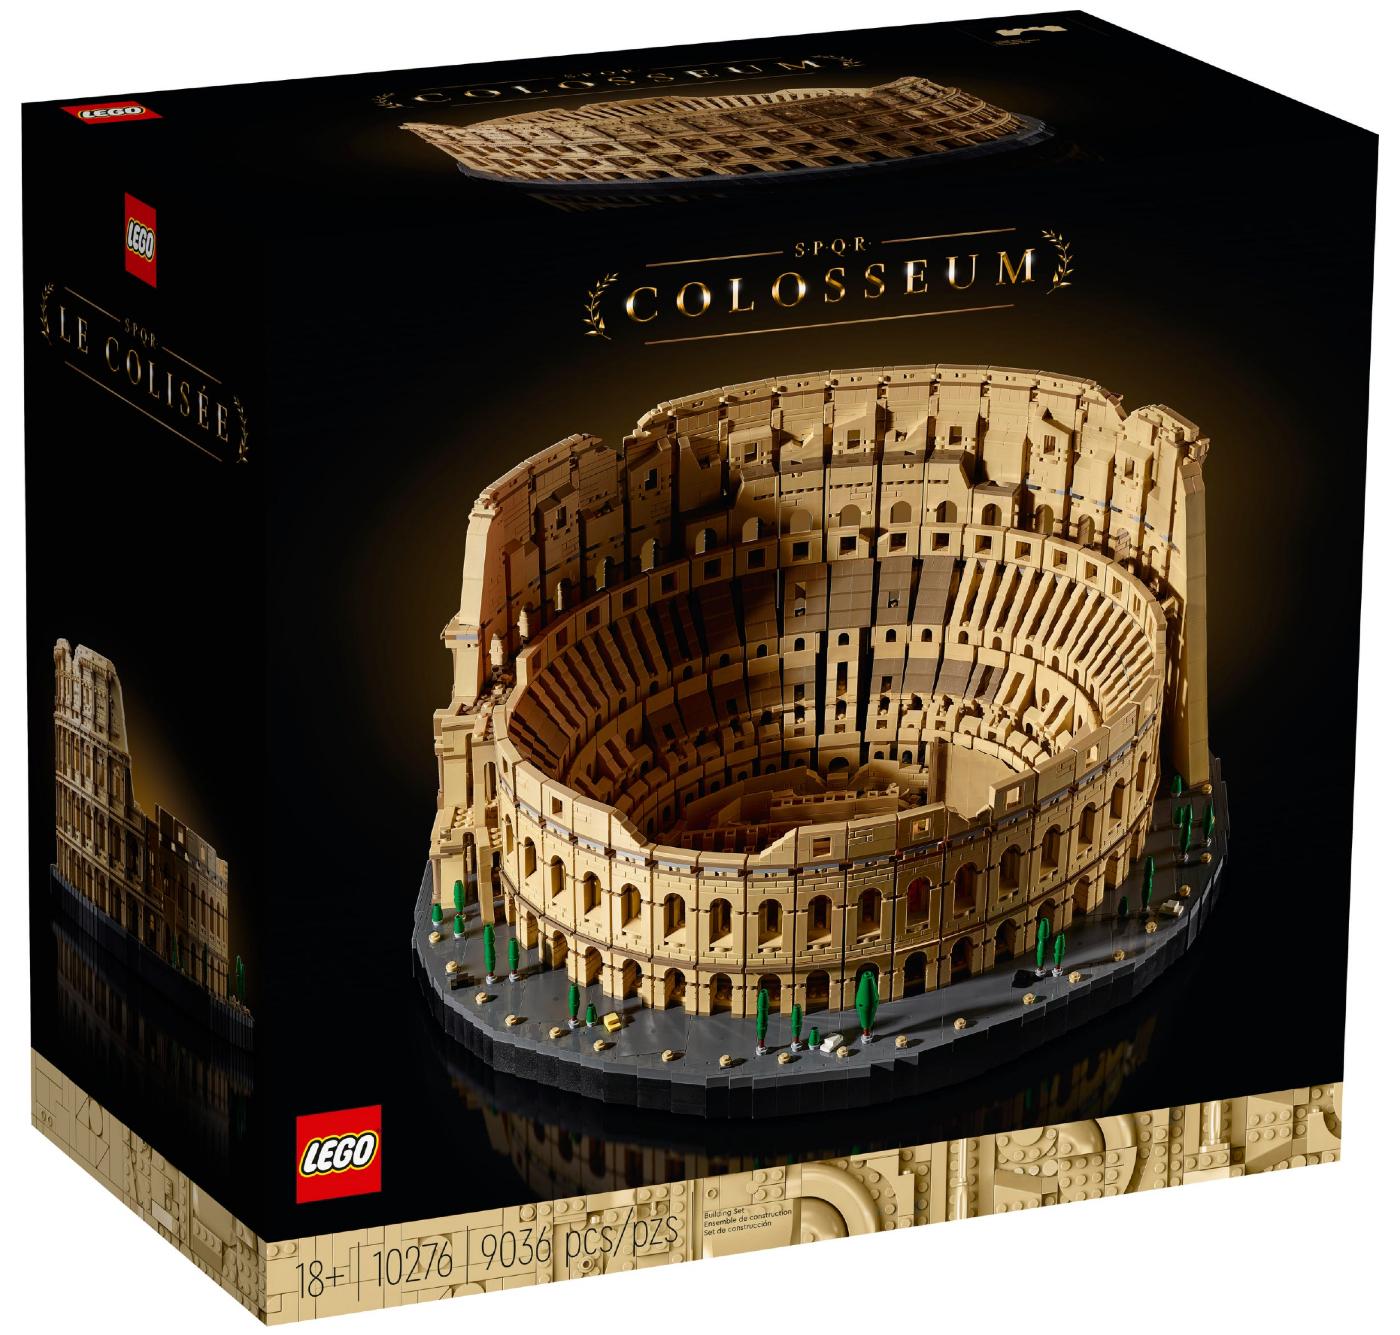 LEGO, colosseum, rome, grootste bouwset, set